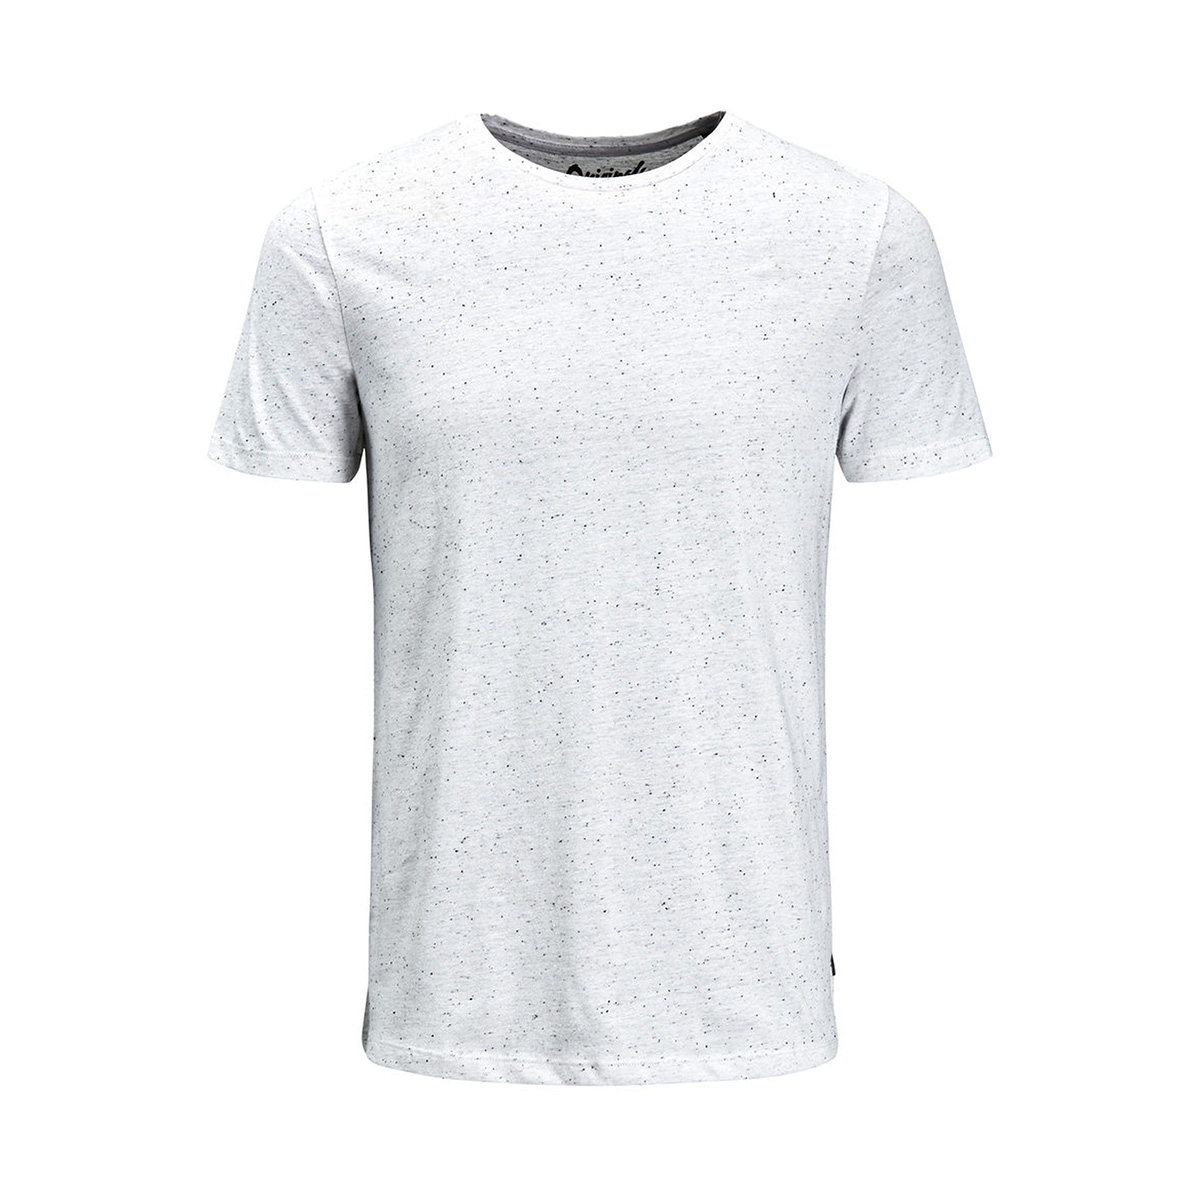 jortort tee melange pack 12125157 jack & jones t-shirt cloud dancer